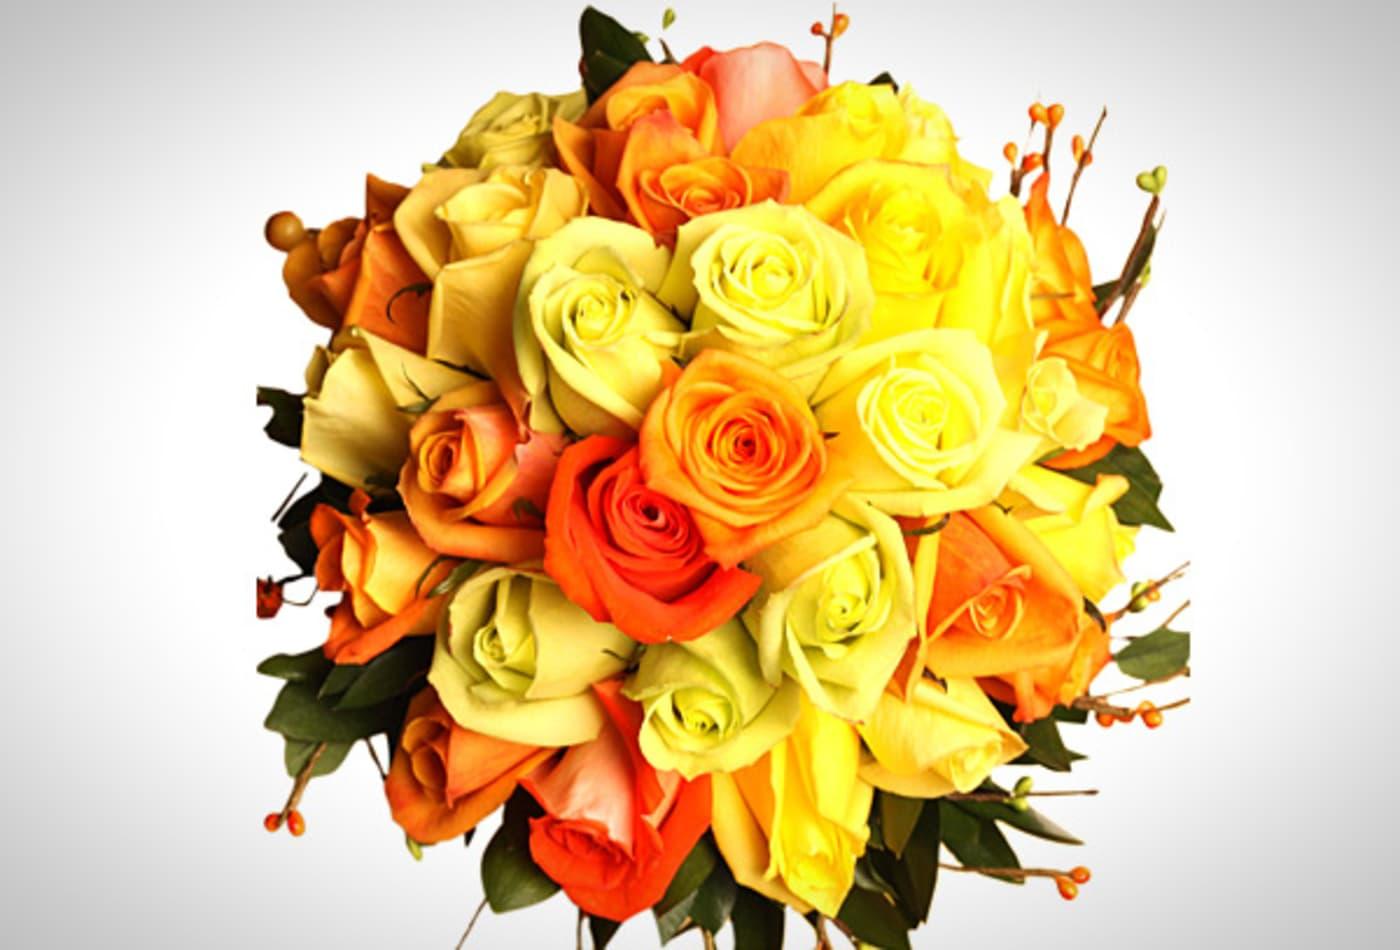 cosco-wedding-flowers.jpg